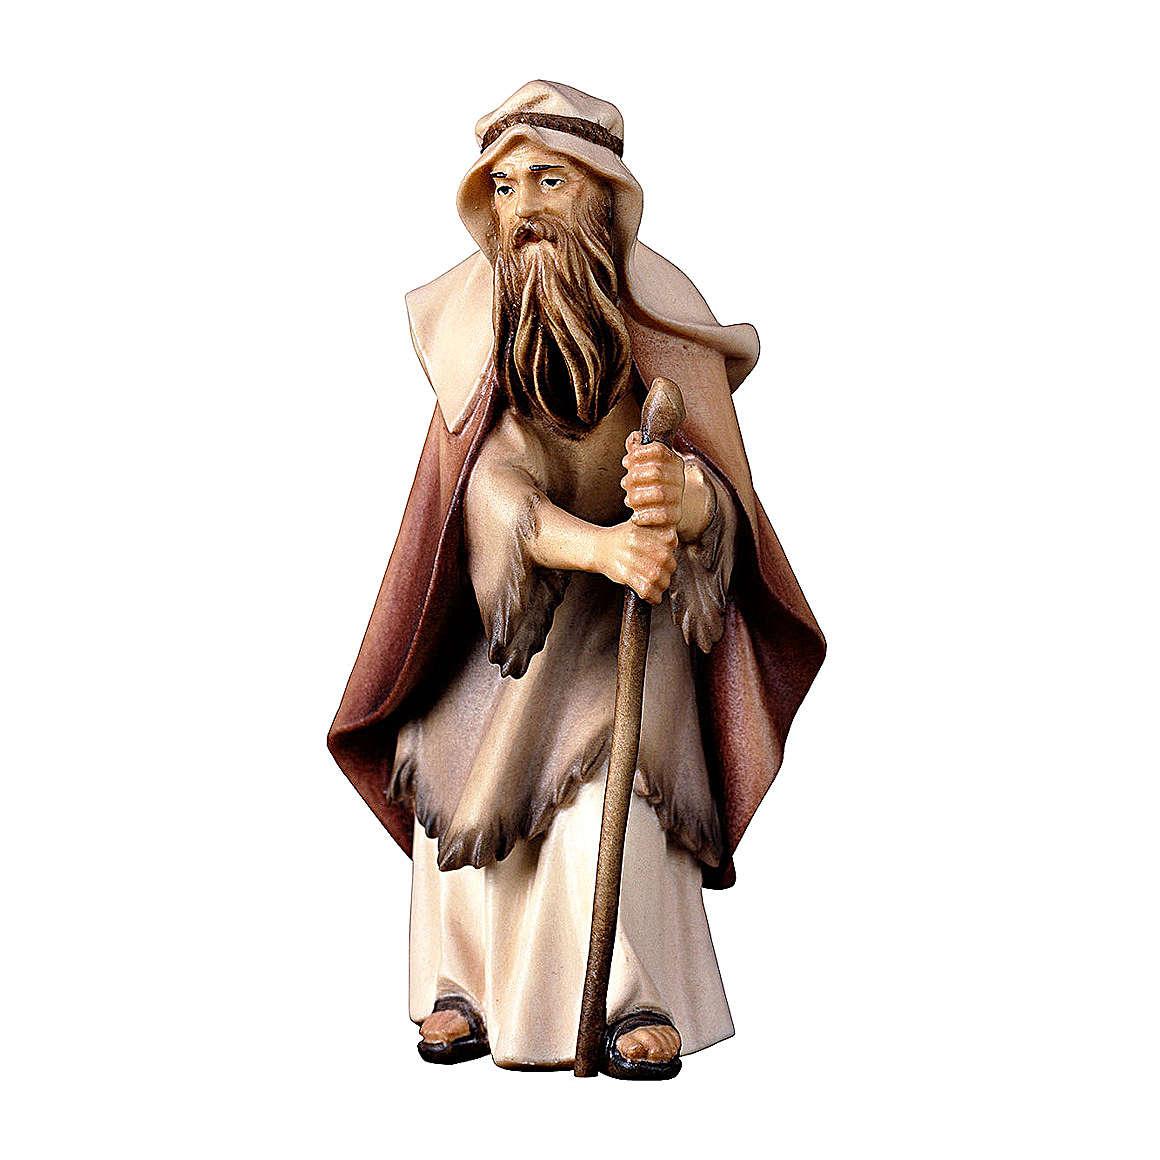 Anziano pastore con bastone presepe Original legno Valgardena 12 cm 4